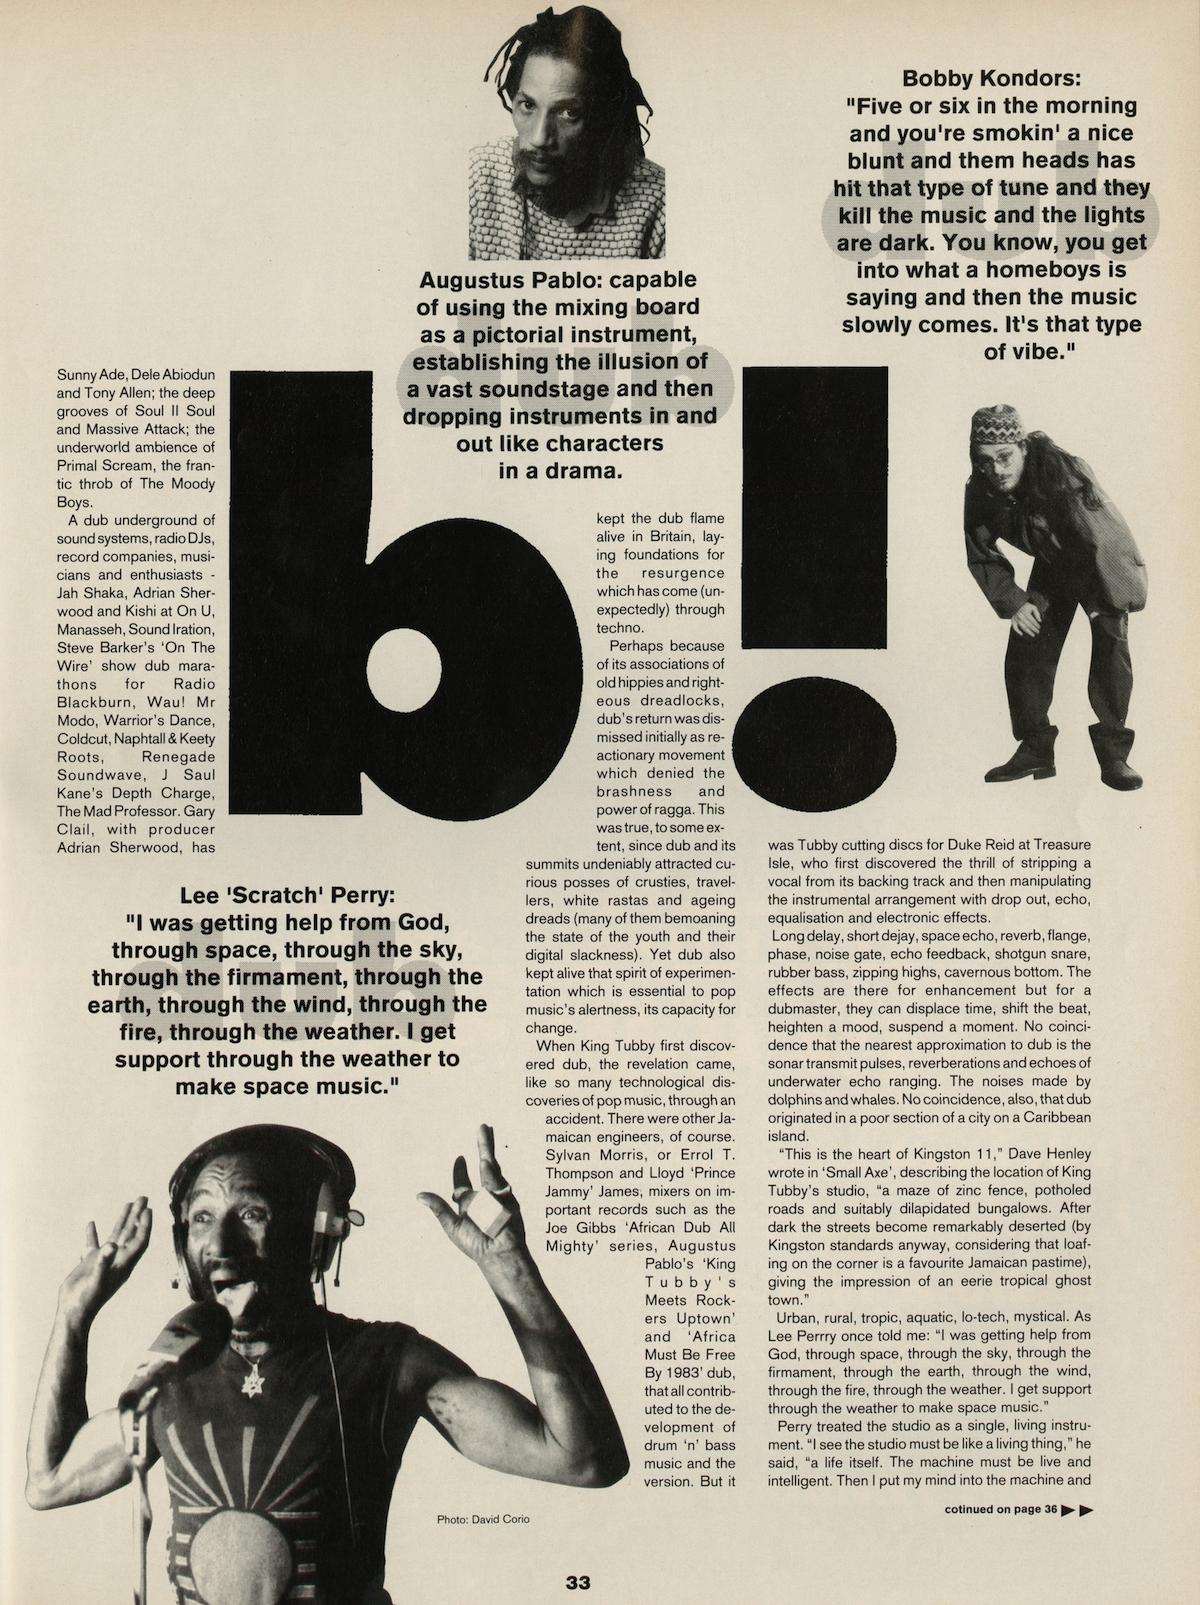 Dub, David Toop, Jah Shaka, Walter Gibbons. Adrian Sherwood, Augustus Pablo, Booby Konders, Lee Scratch Perry, Adrian Sherwood, Gary Clail